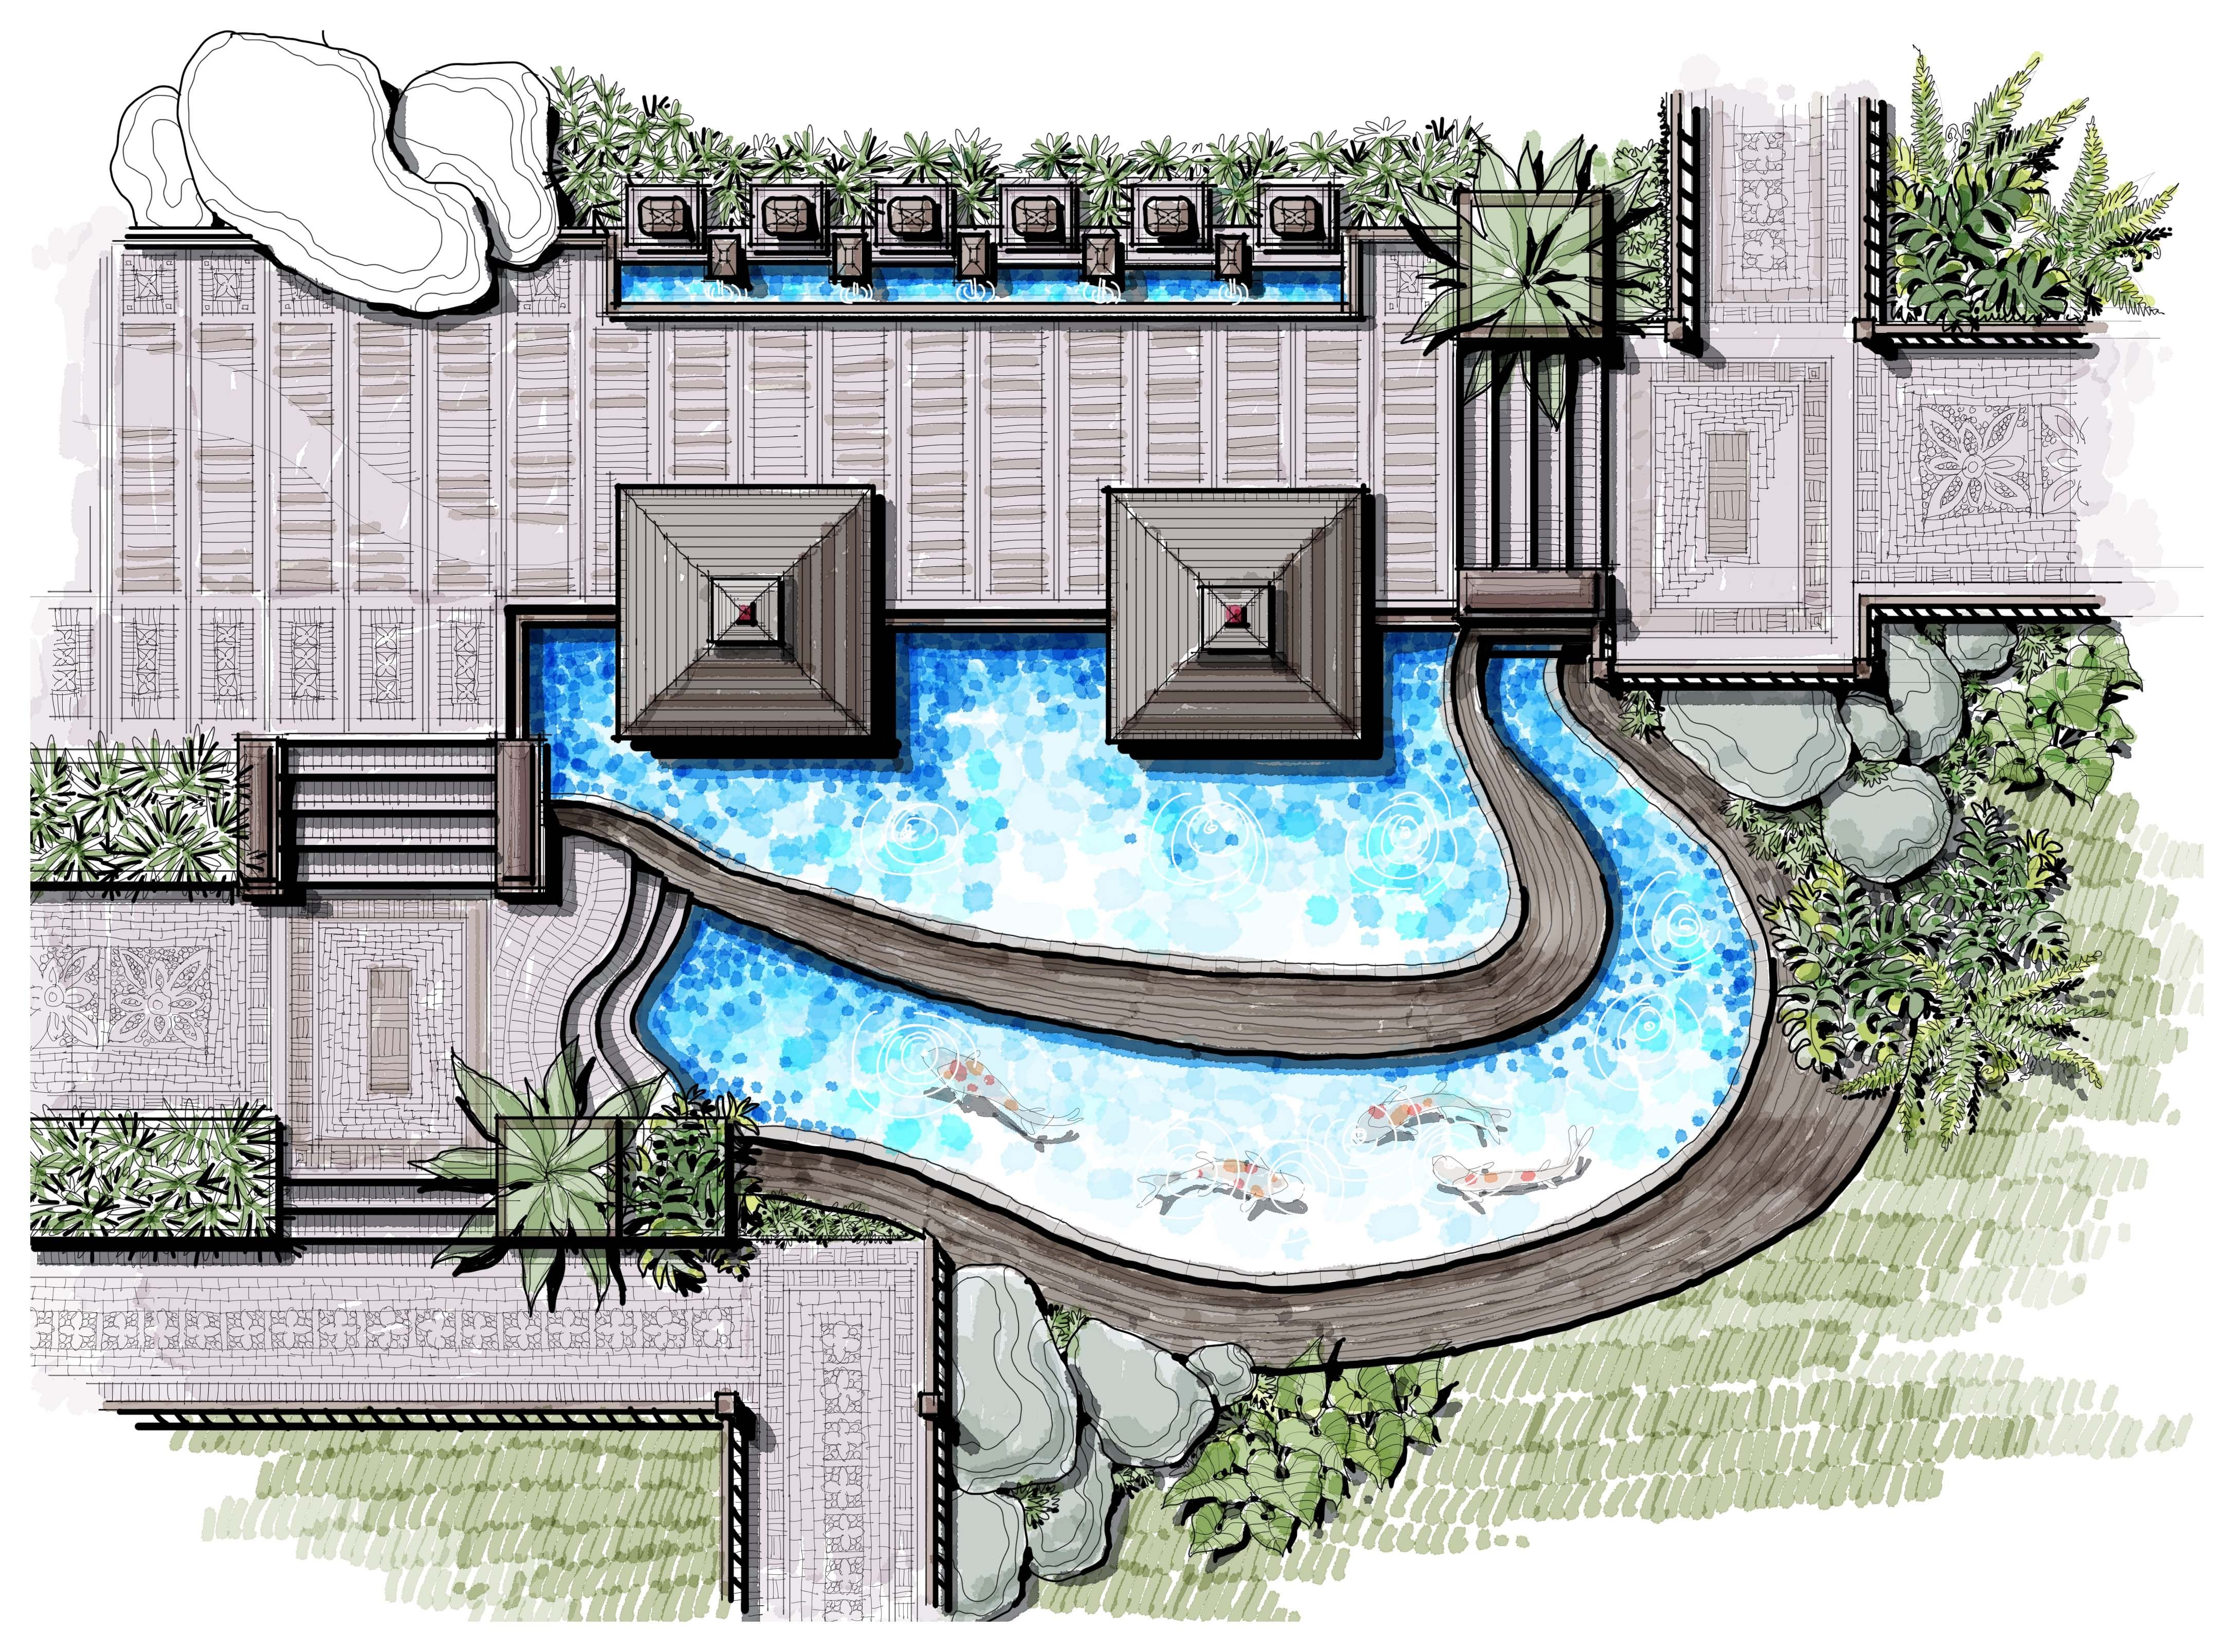 water garden, edge pool, infinity pool landscape, koi pond ...